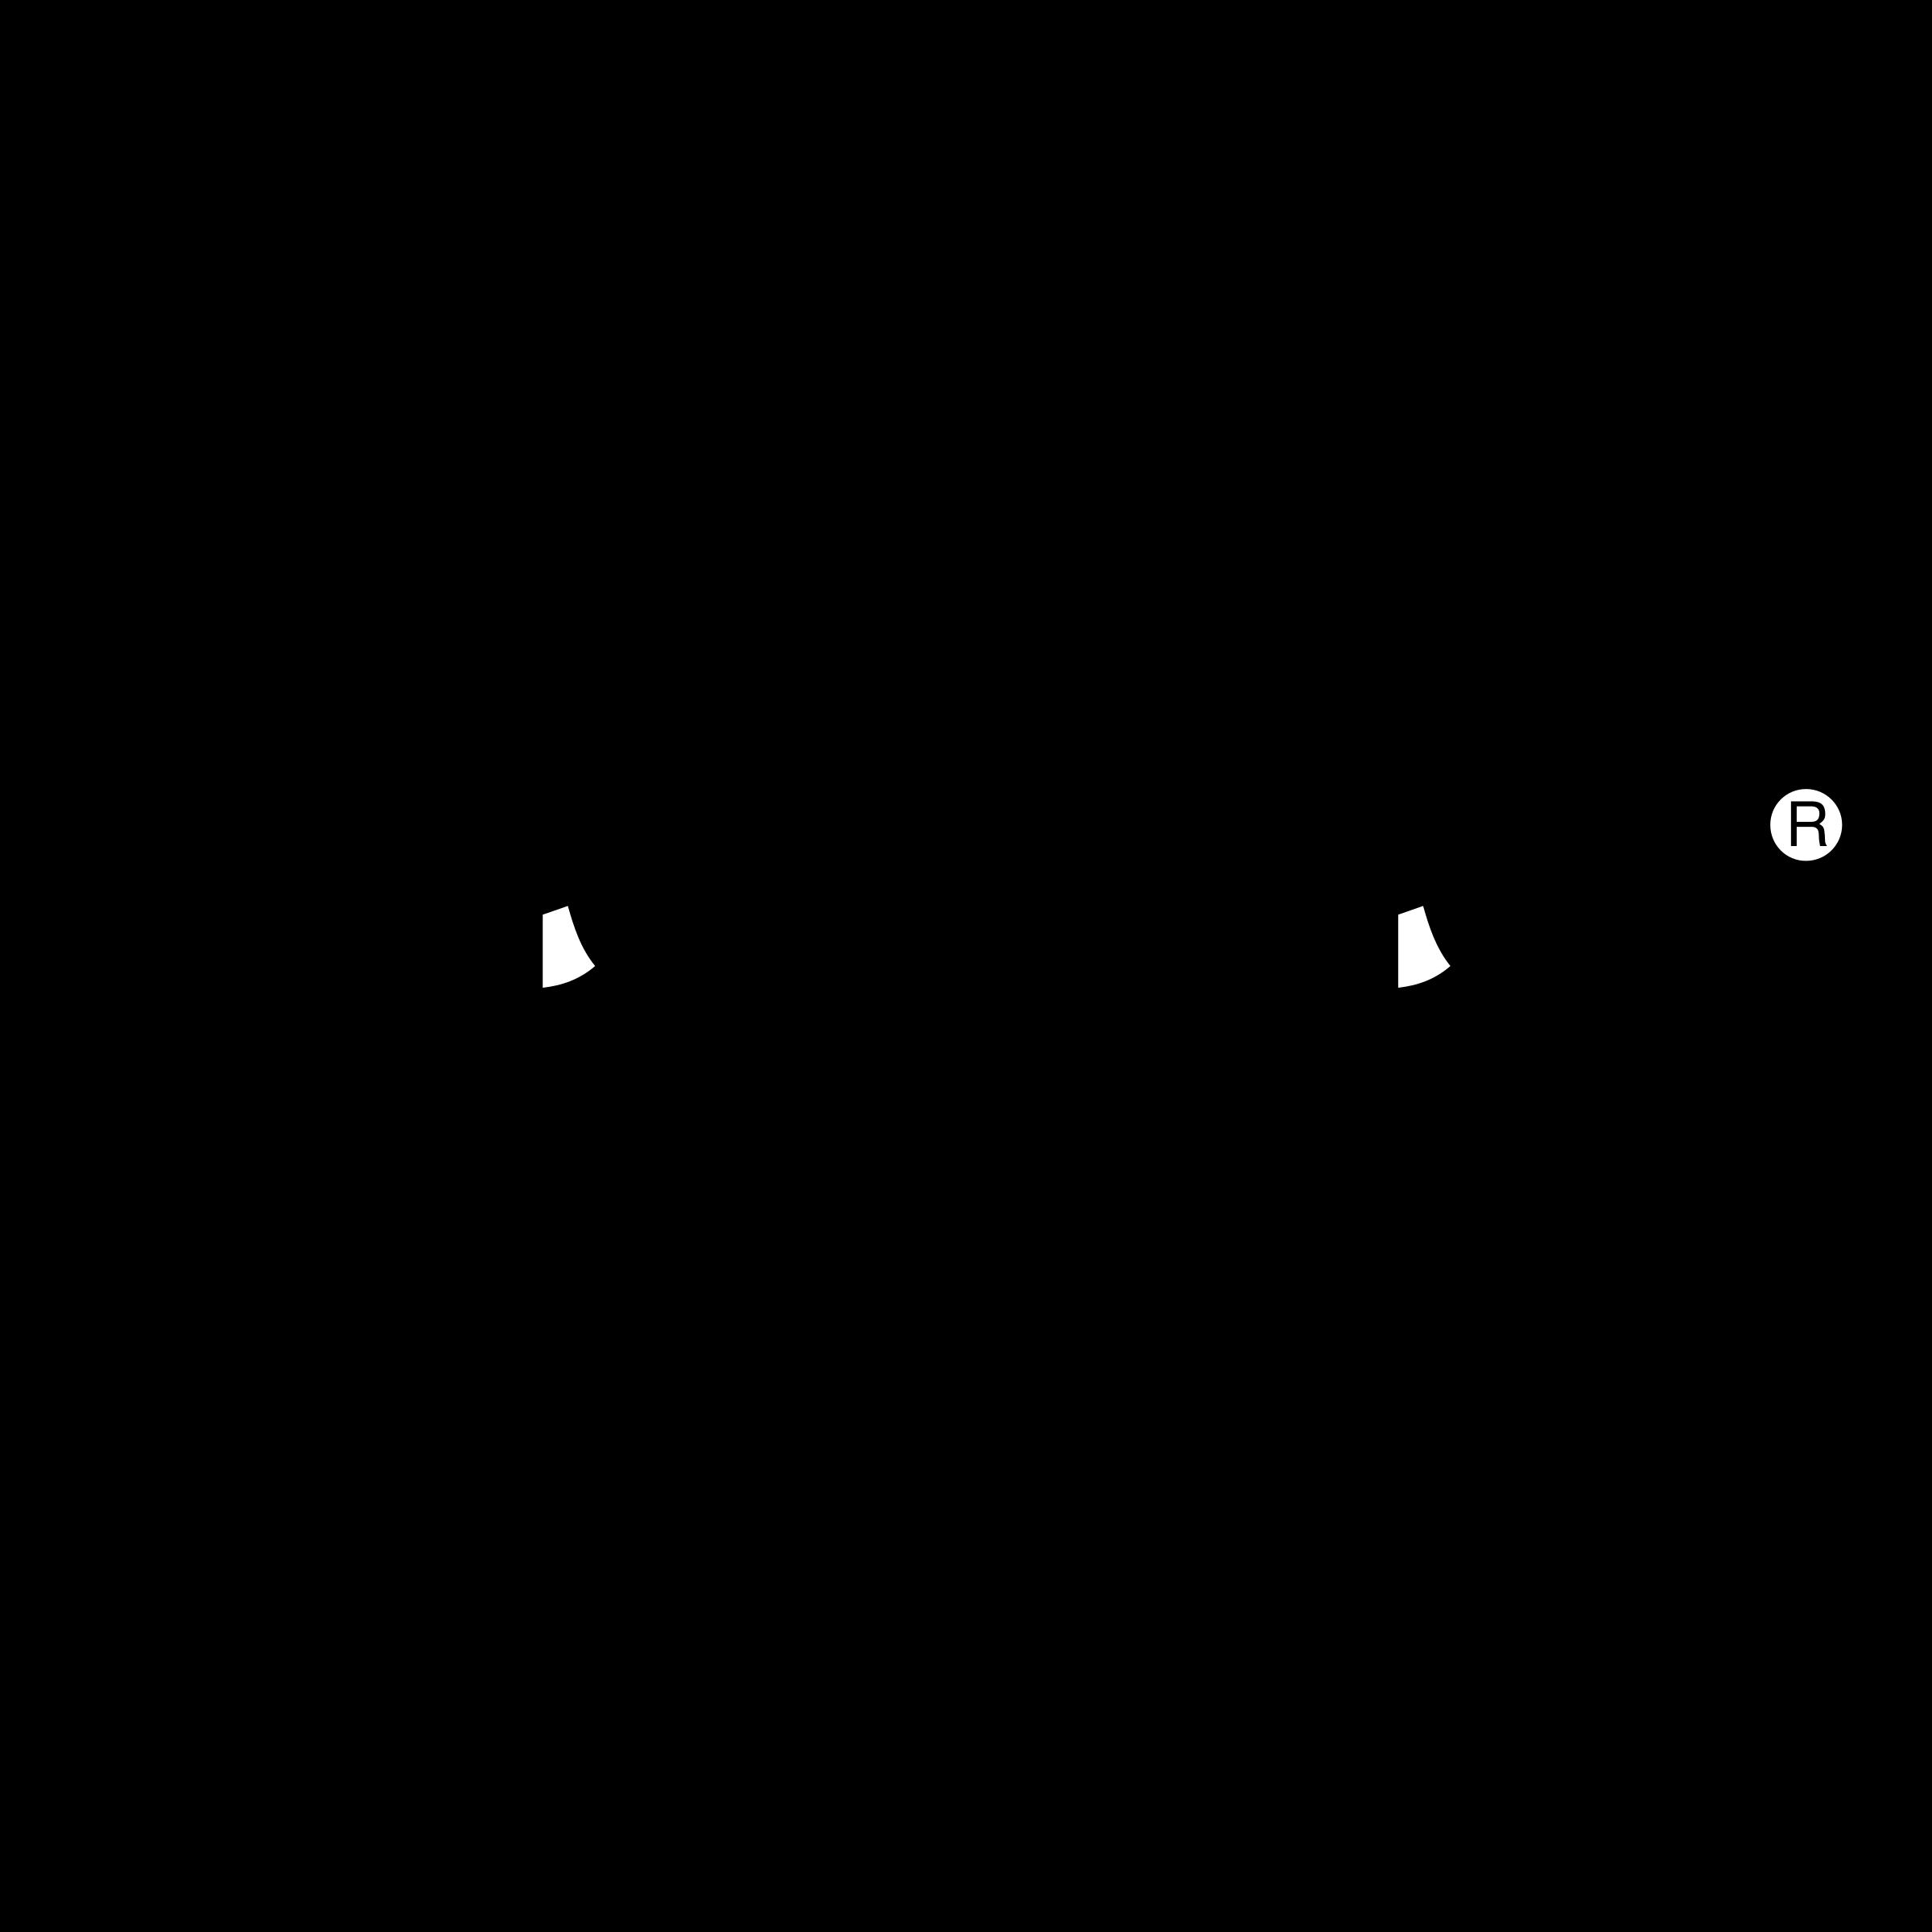 selmer-logo.png